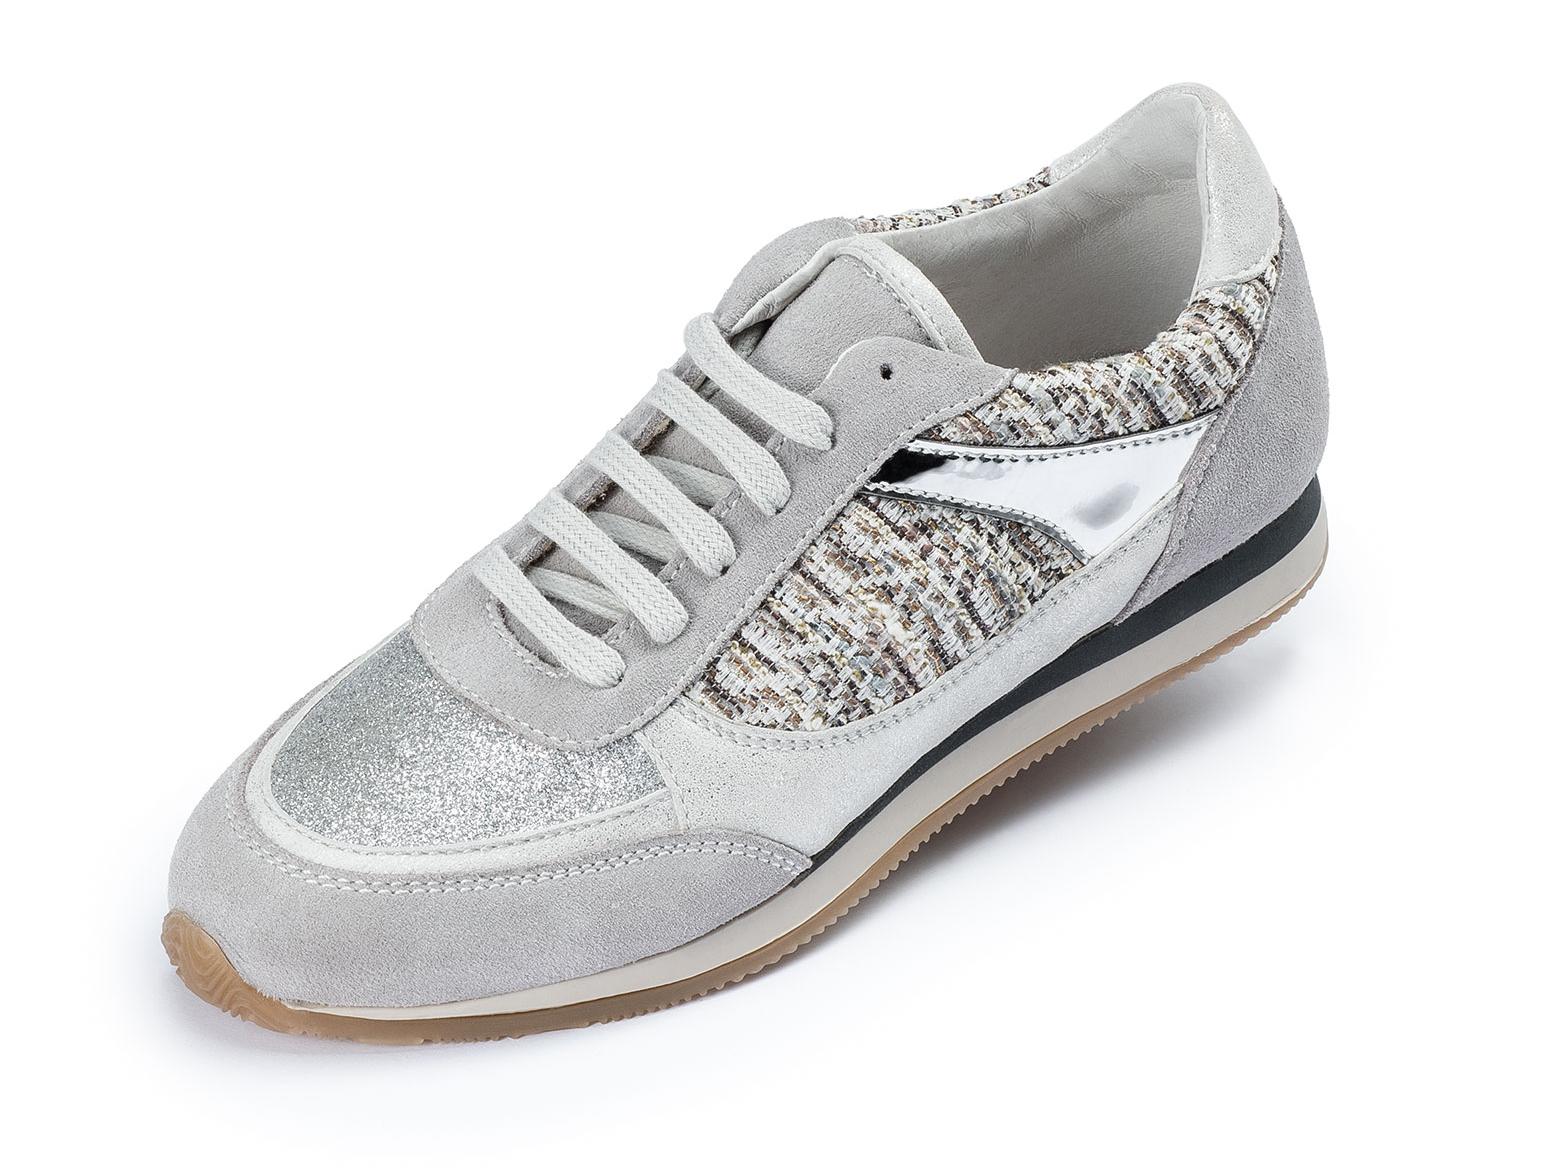 innovative design 7f6c2 d1a4c Damen Leder Casual Sneaker Halbschuhe Freizeit Sport Schuhe Schnürschuhe  grau   dynamic-24.de